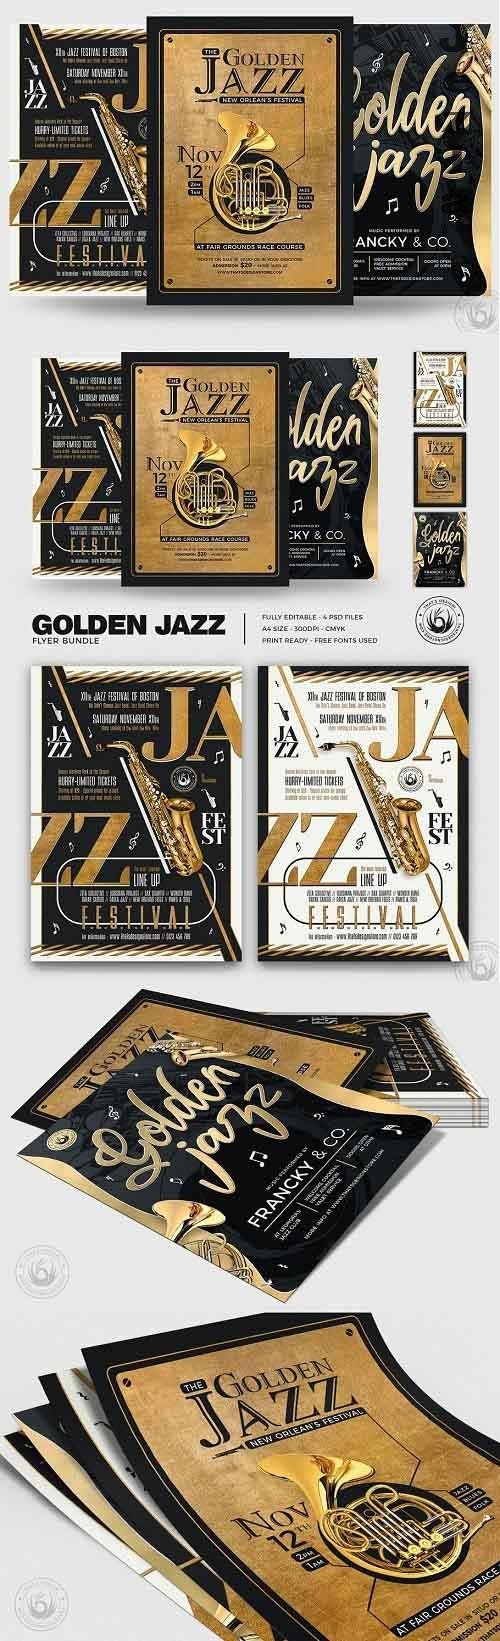 Golden Jazz Flyer Bundle - 4980753